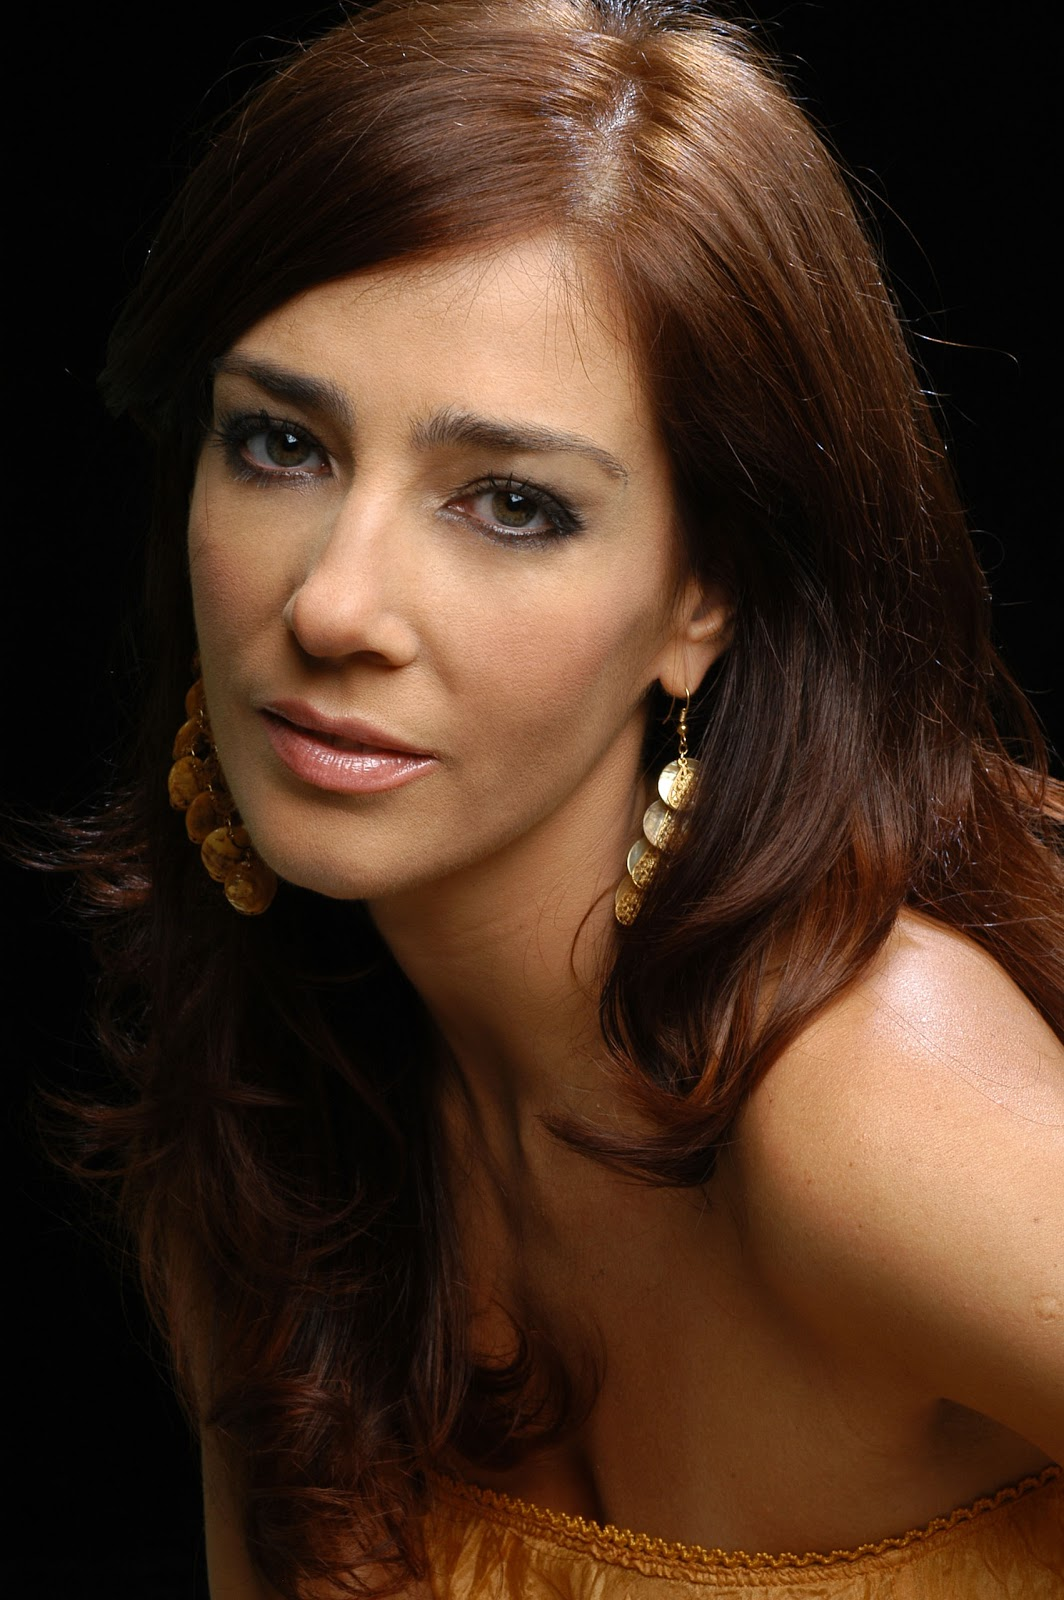 Cristina Perez despechada, Furriel vuelve con Paola Krum